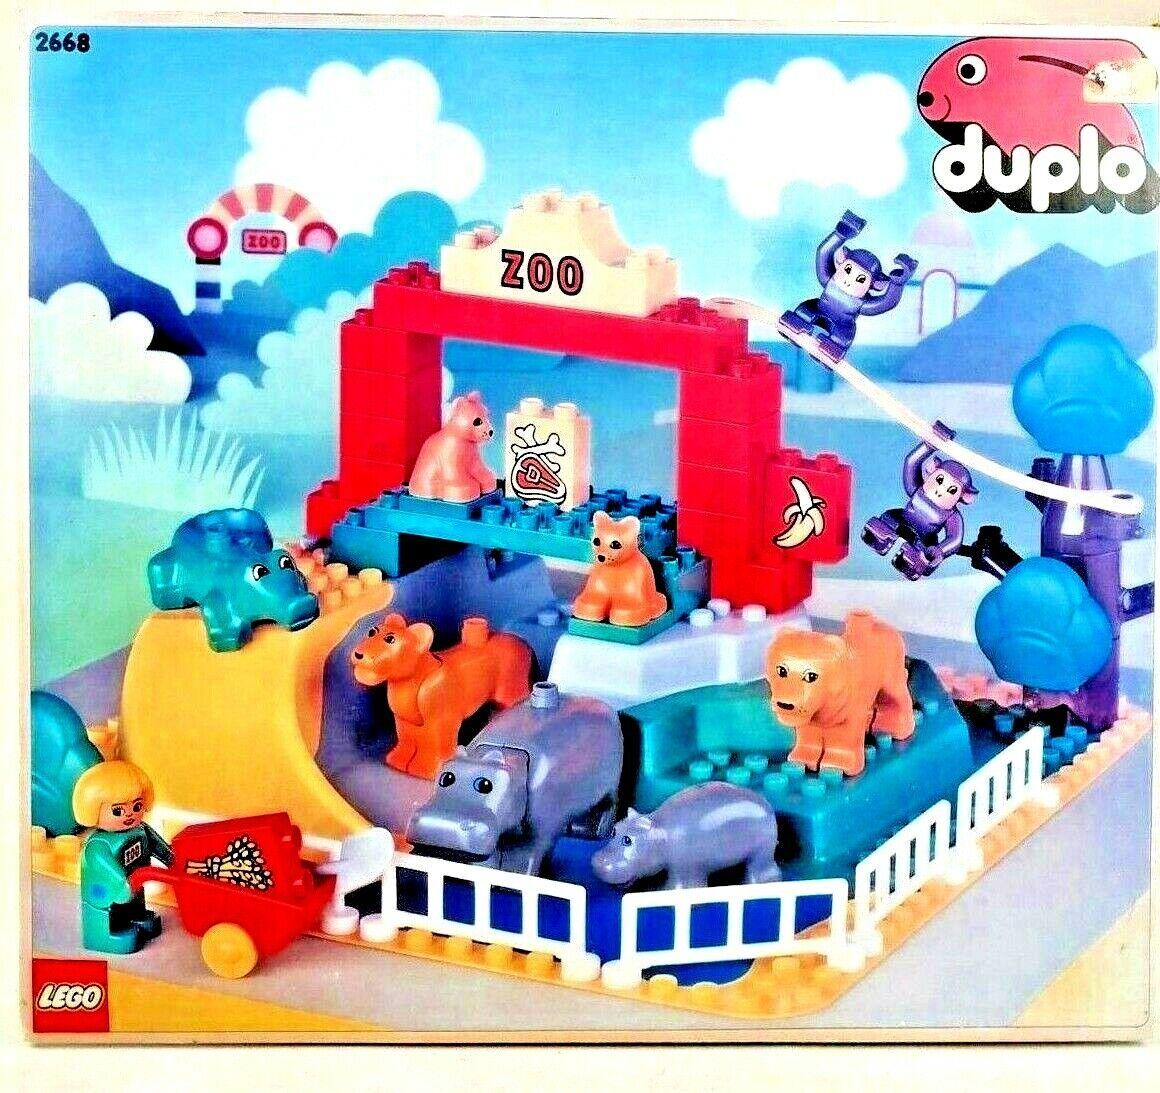 RARE VINTAGE 1991 LEGO DUPLO 2668 ZOO PLAY SET NEW